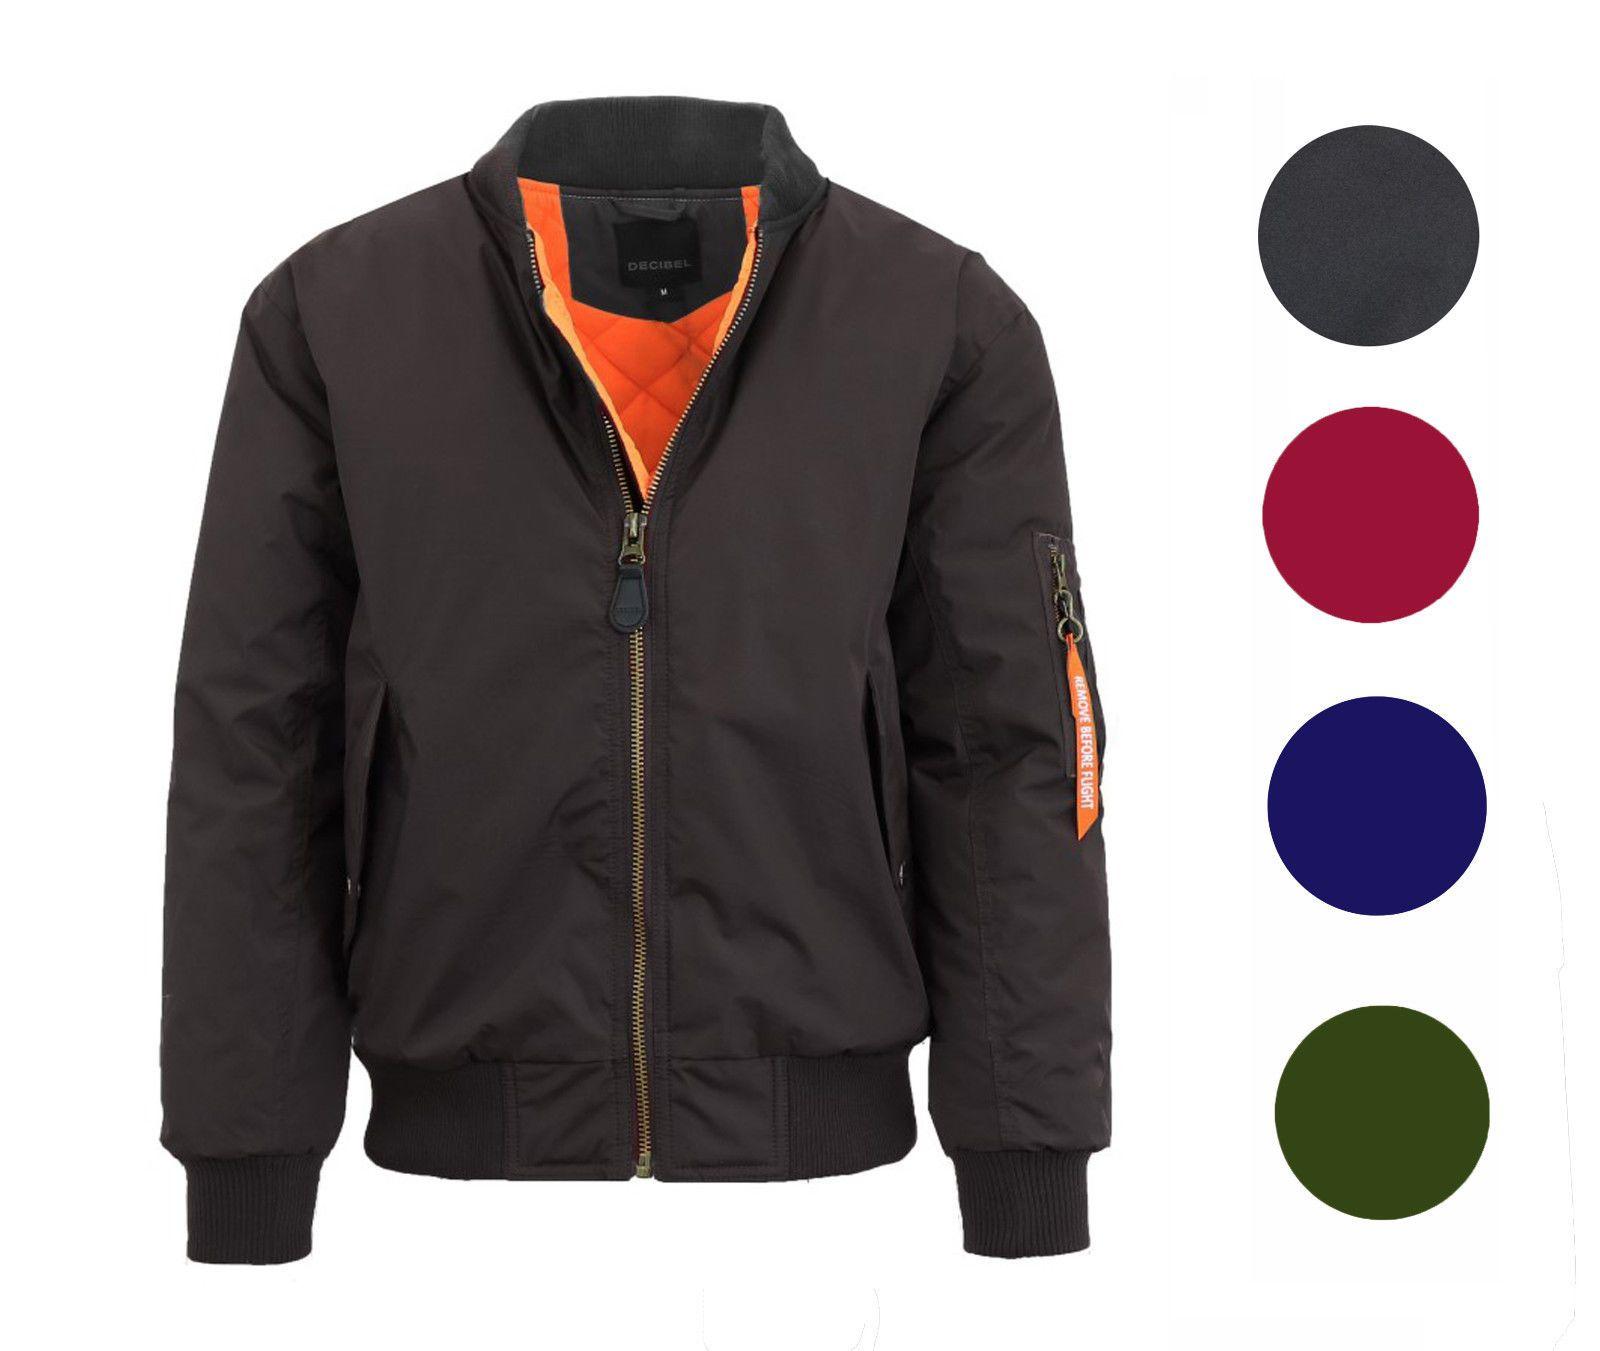 Mens Heavy Weight Ma 1 Flight Bomber Jacket Full Zip Outerwear Coat Colors Nwt Bomber Coat Colors Fli Flight Bomber Jacket Bomber Jacket Bomber Jacket Men [ 1351 x 1600 Pixel ]